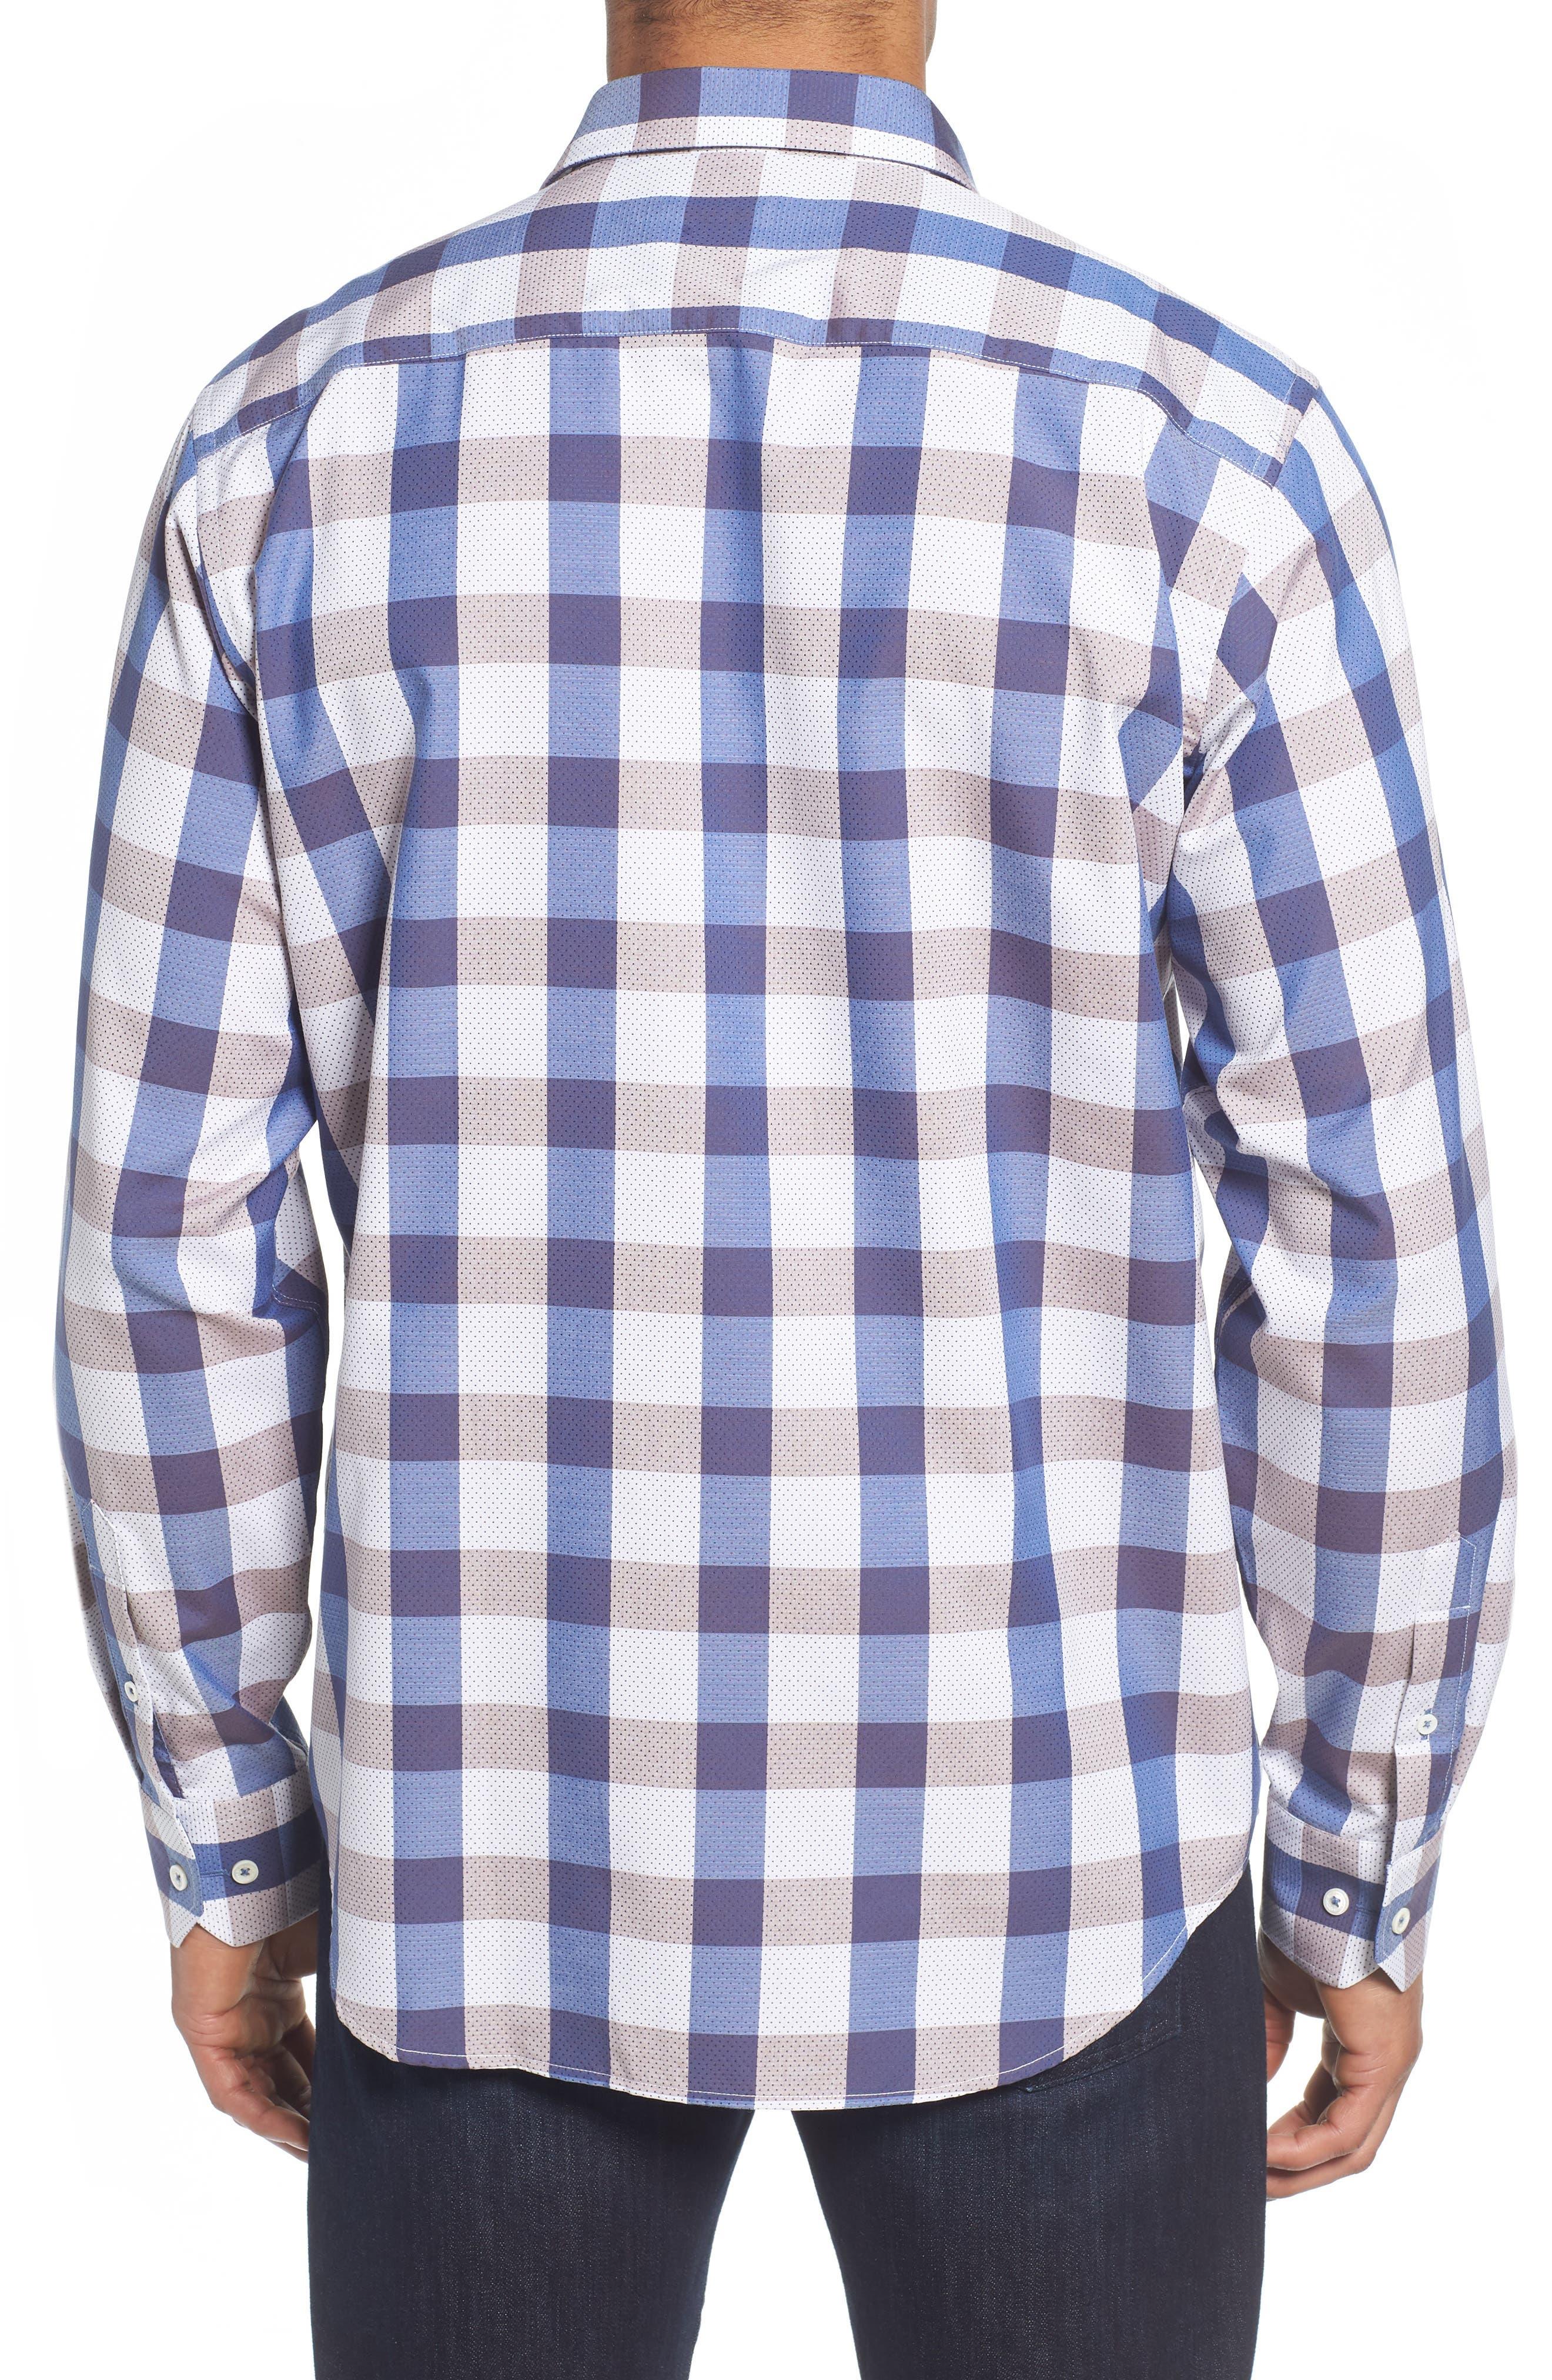 BUGATCHI,                             Classic Fit Check on Dot Sport Shirt,                             Alternate thumbnail 2, color,                             104